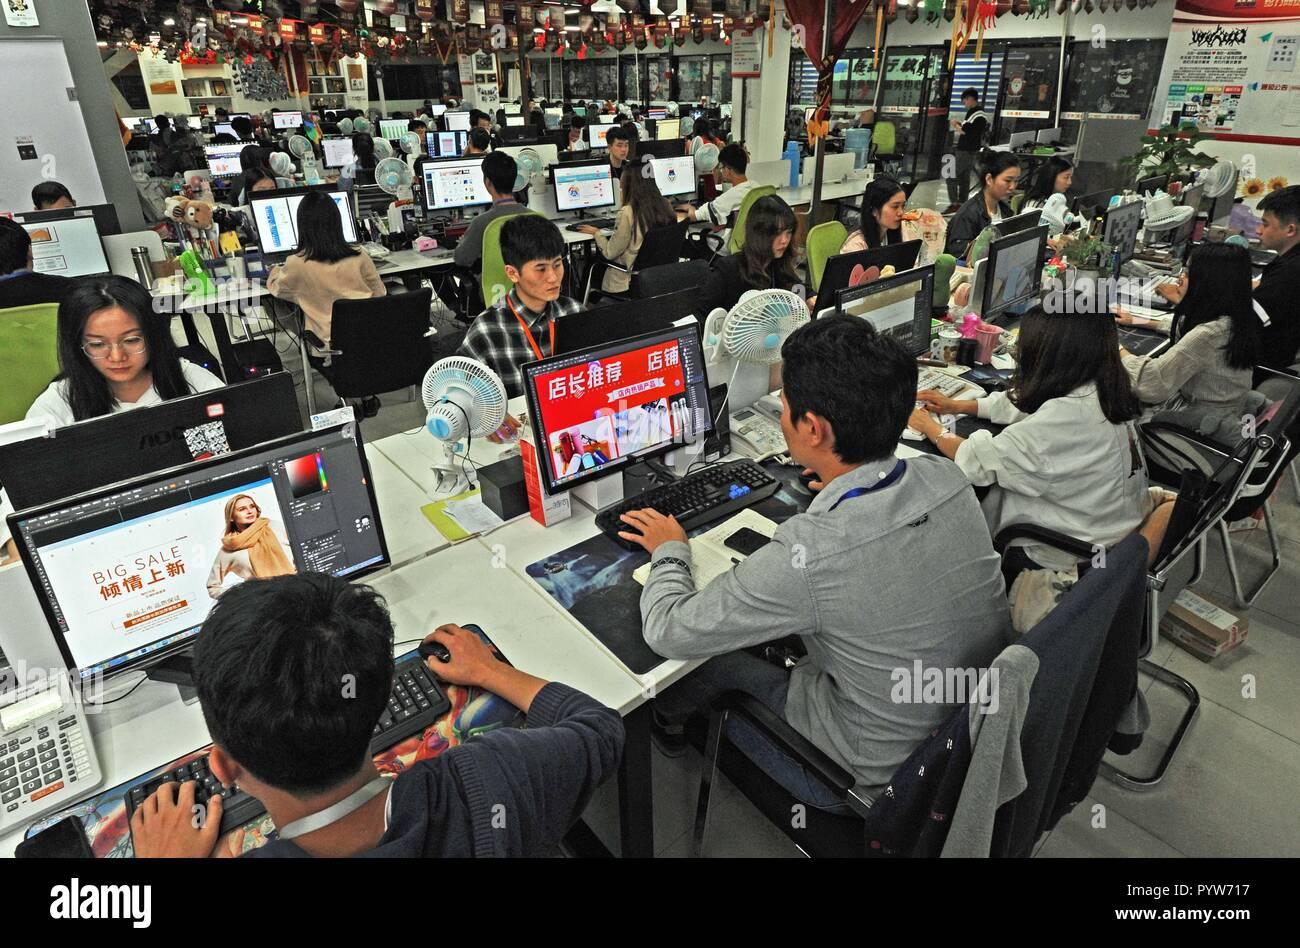 181030) -- YIWU, Oct  30, 2018 (Xinhua) -- Staff members